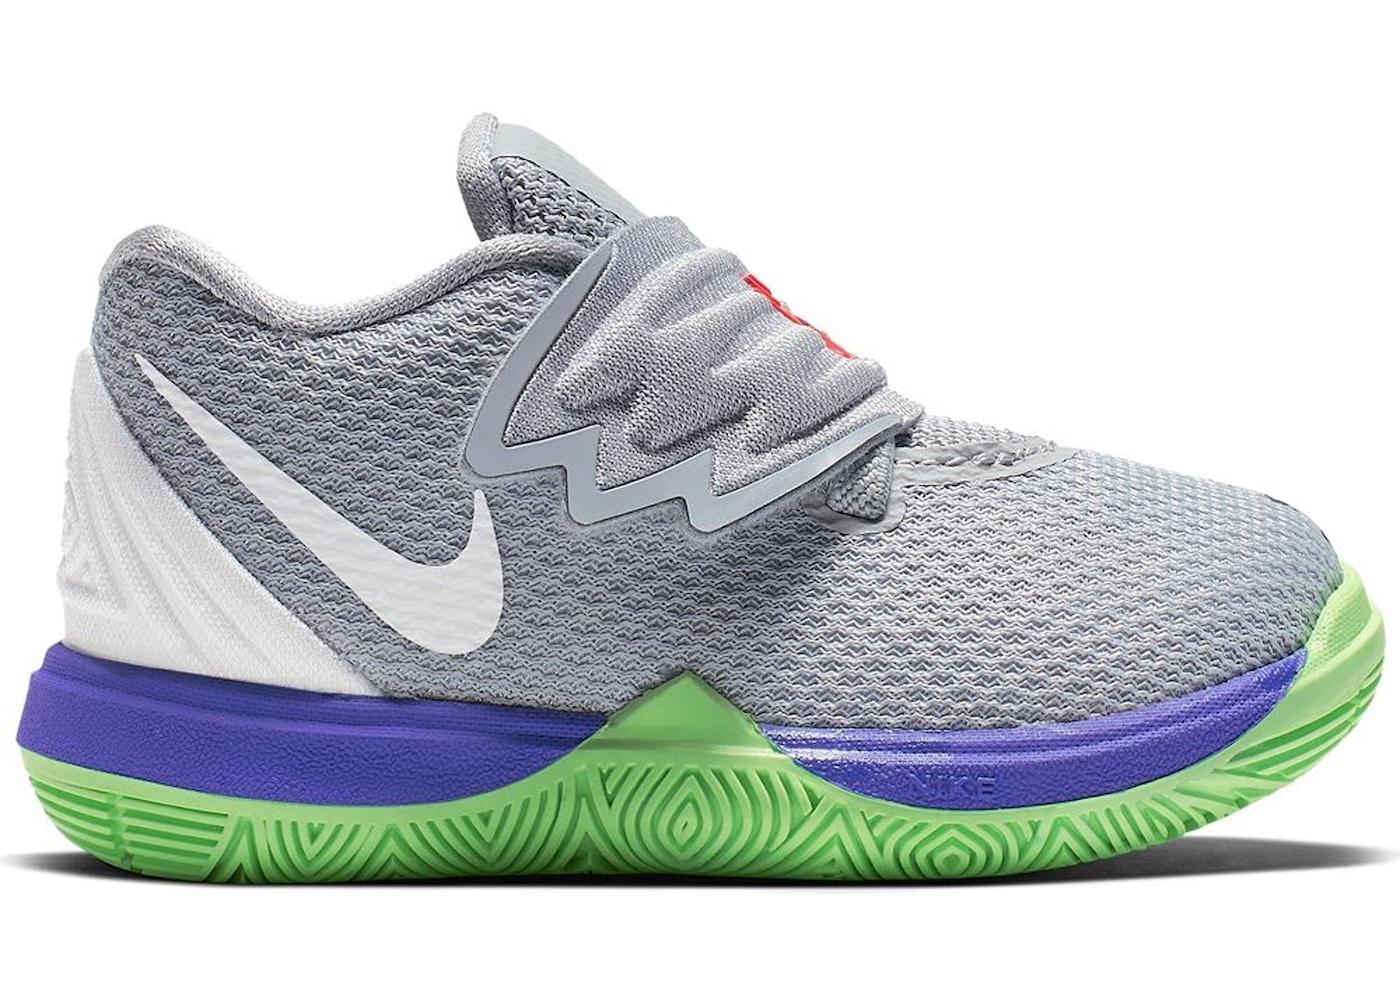 ea538804222 Nike Basketball Kyrie Shoes - Release Date